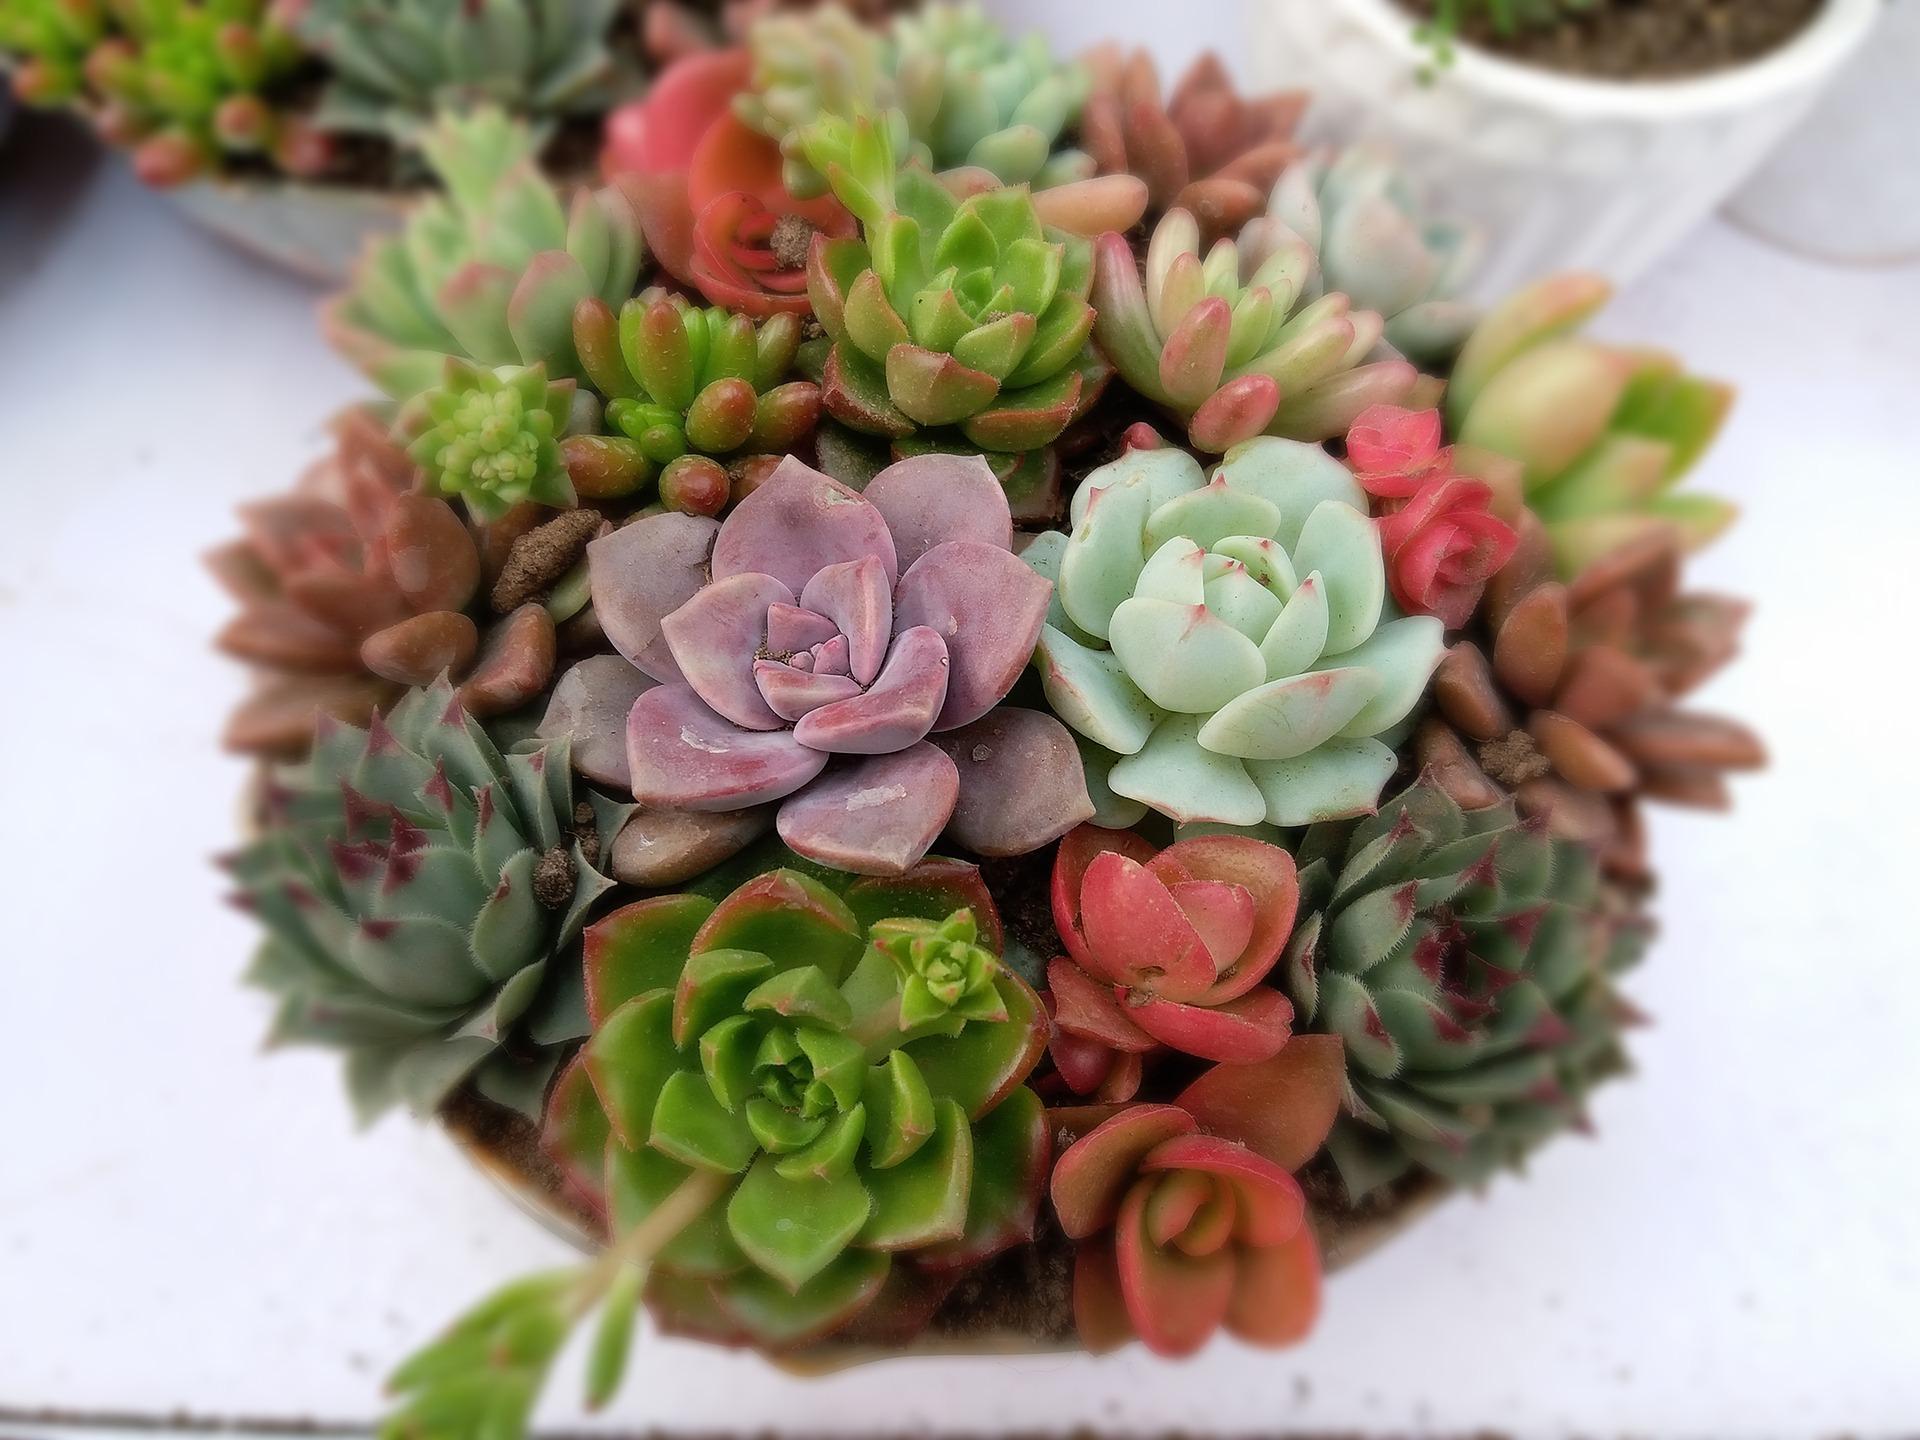 succulent-plants-2045388_1920.jpg